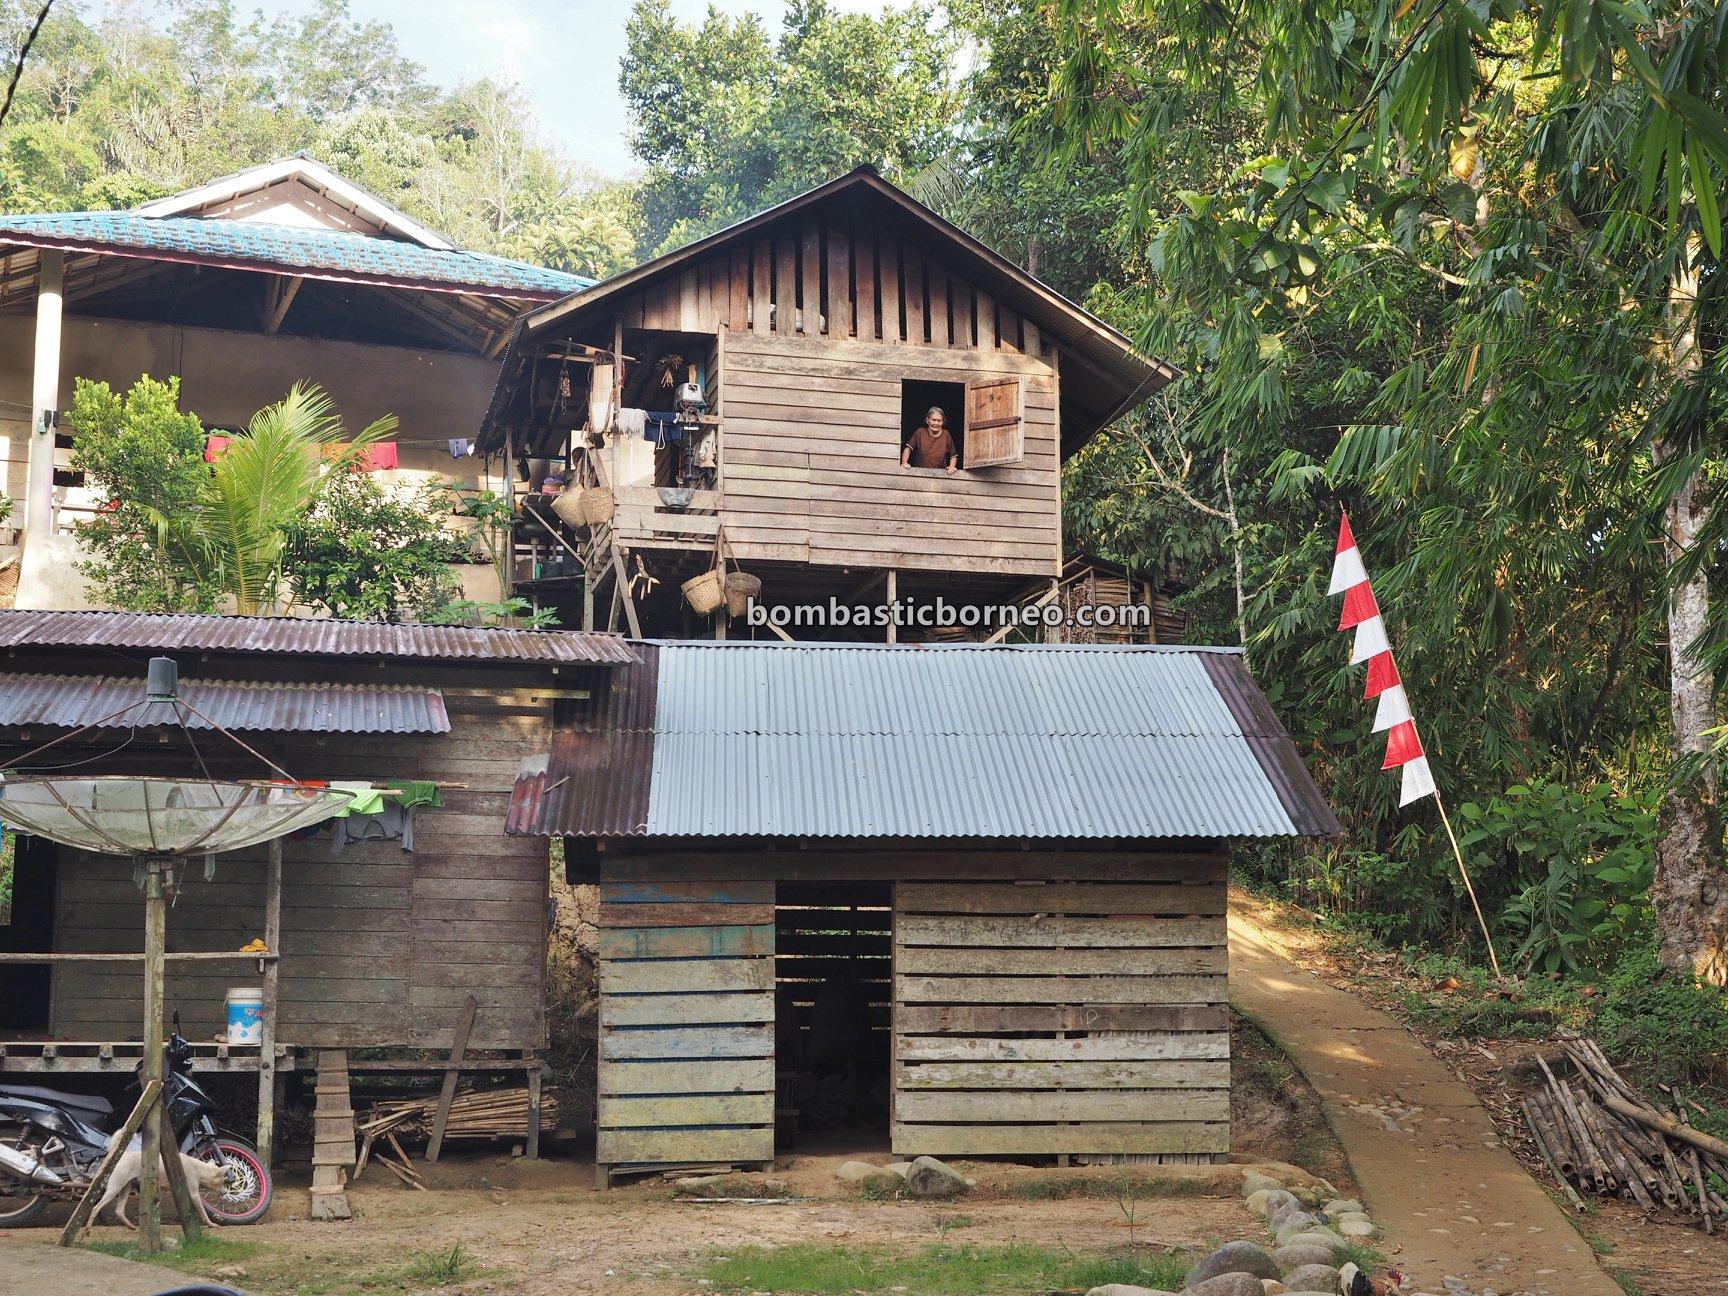 Sungkung Medeng, indigenous, West Kalimantan, Siding, Ethnic, native, Dayak Bidayuh, tribal, tourism, tourist attraction, Travel guide, Trans Border, 跨境婆罗洲游踪, 印尼西加里曼丹, 宋宫比达友族,